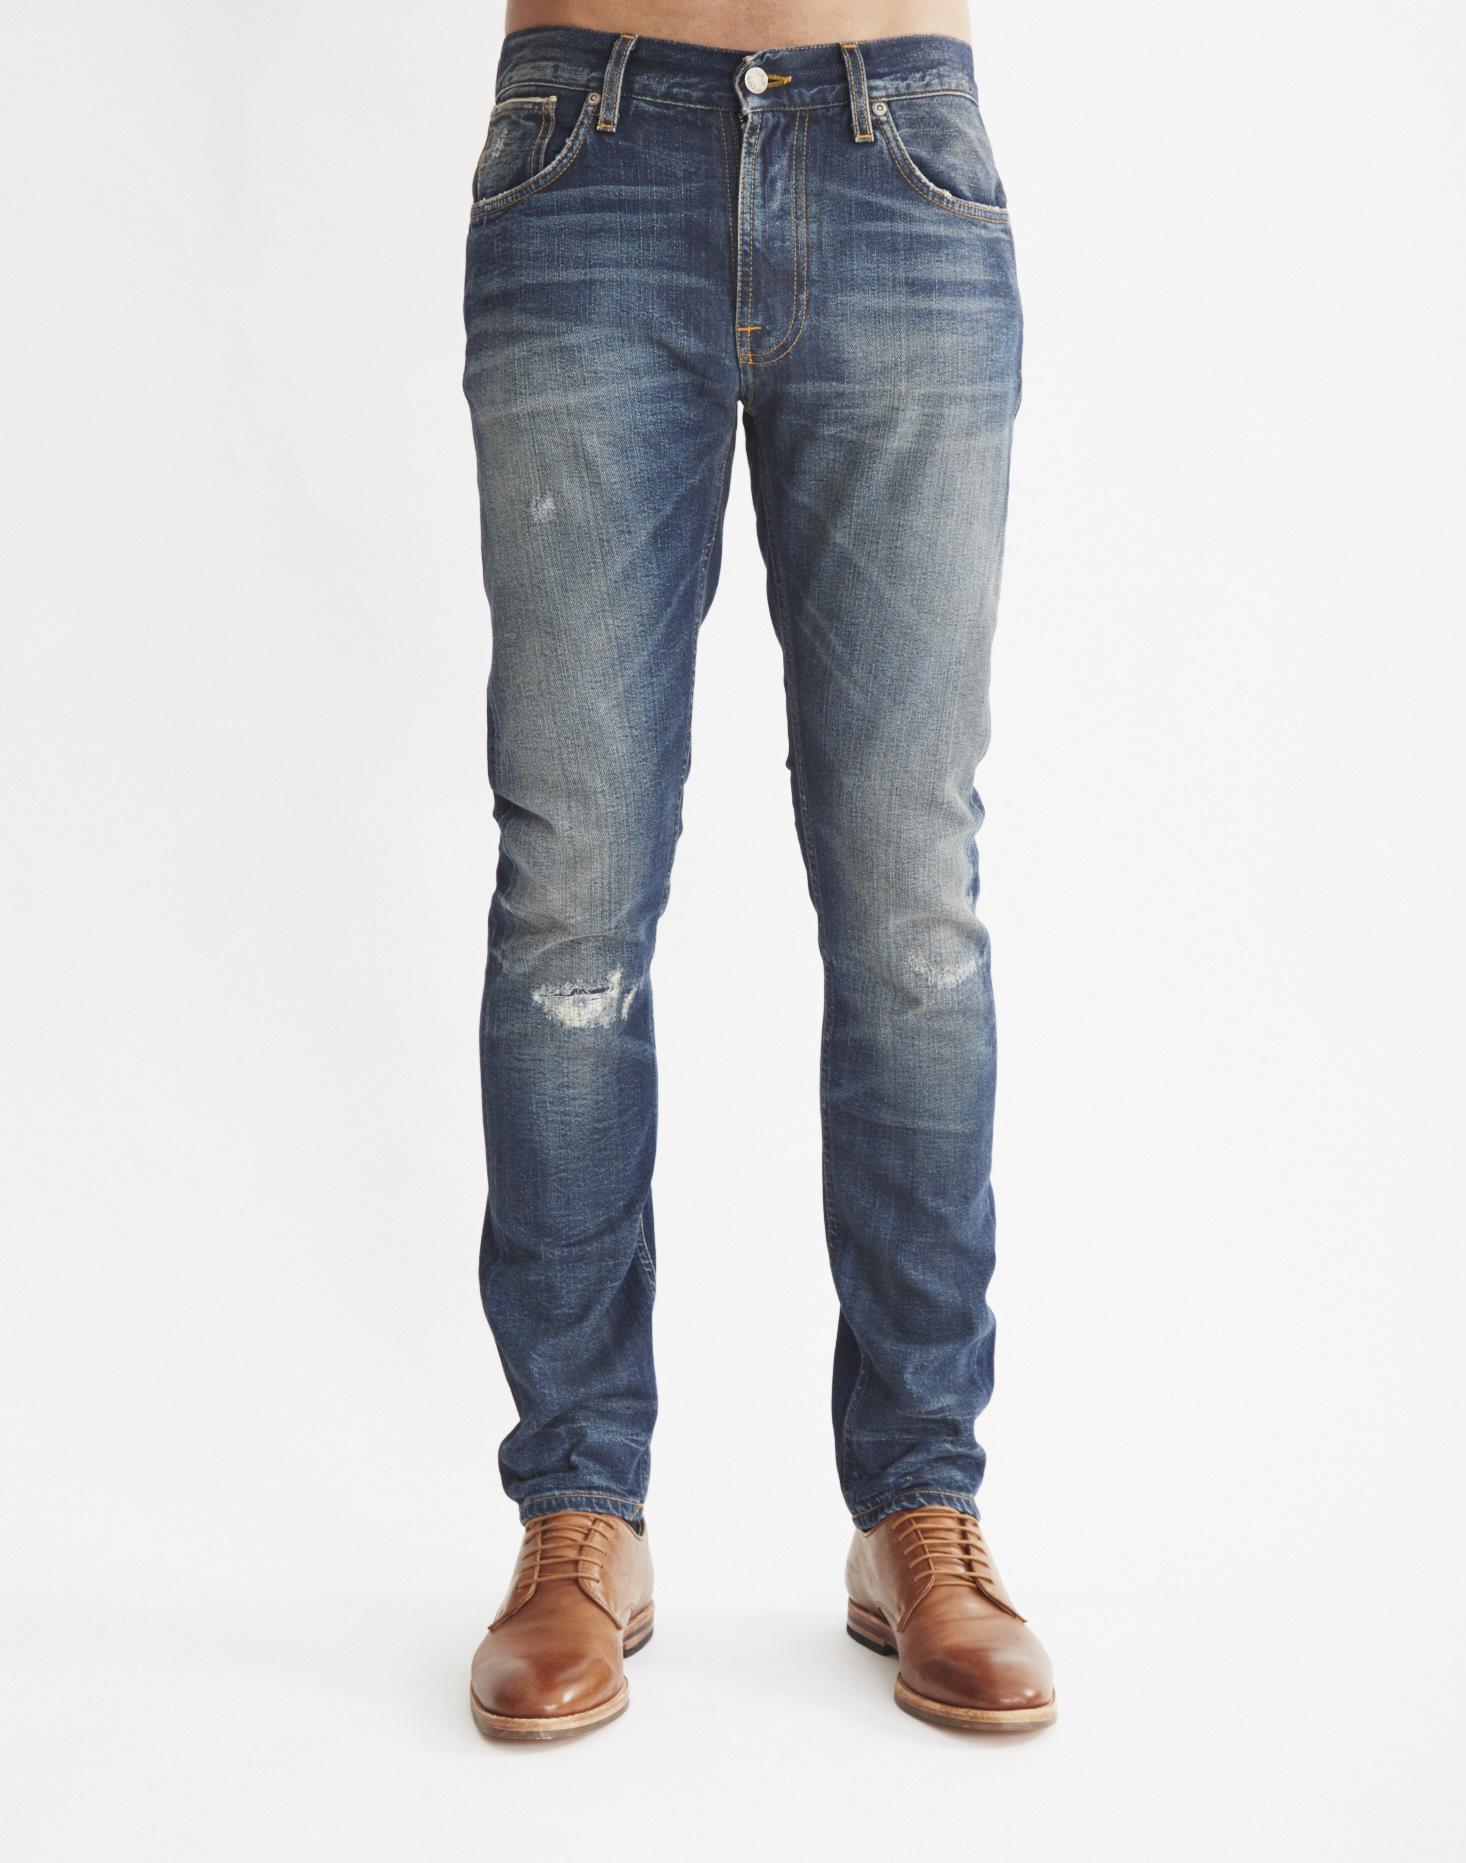 nudie jeans thin finn jonas replica jeans in blue for men. Black Bedroom Furniture Sets. Home Design Ideas